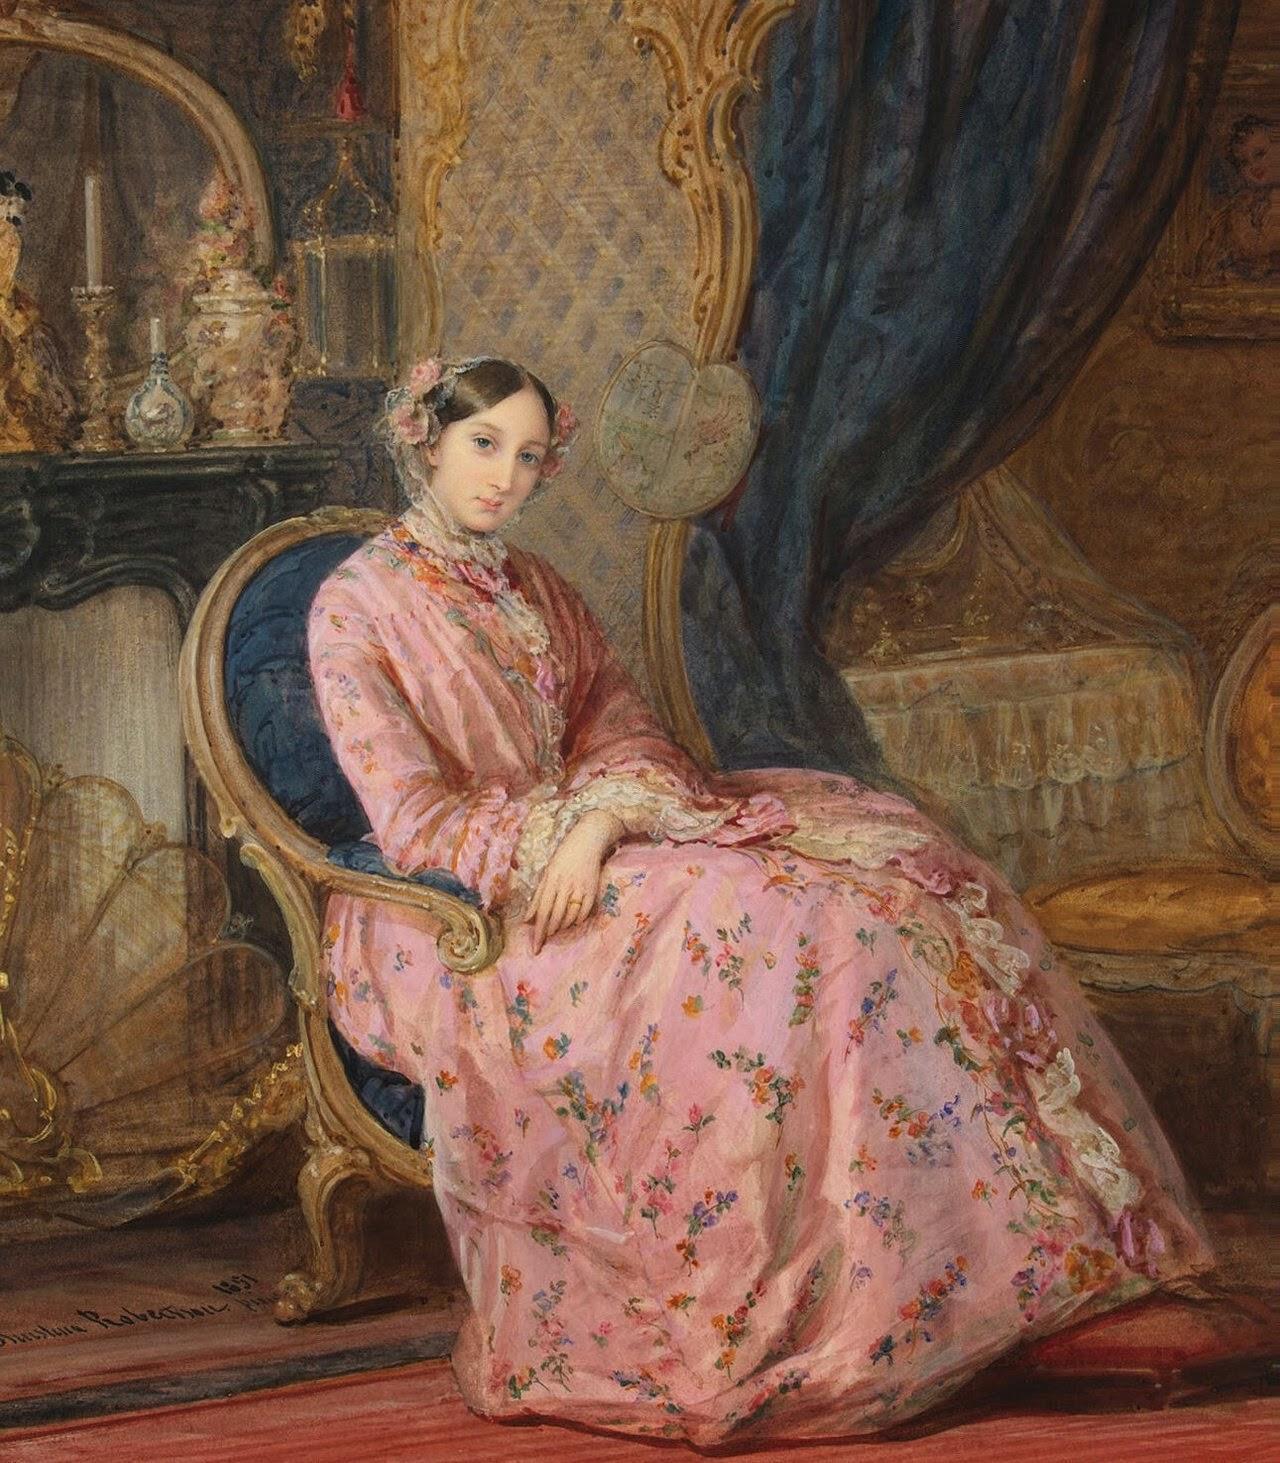 Portrait de la Grande Duchesse Maria Nikolaevna (1851), Christina Robertson